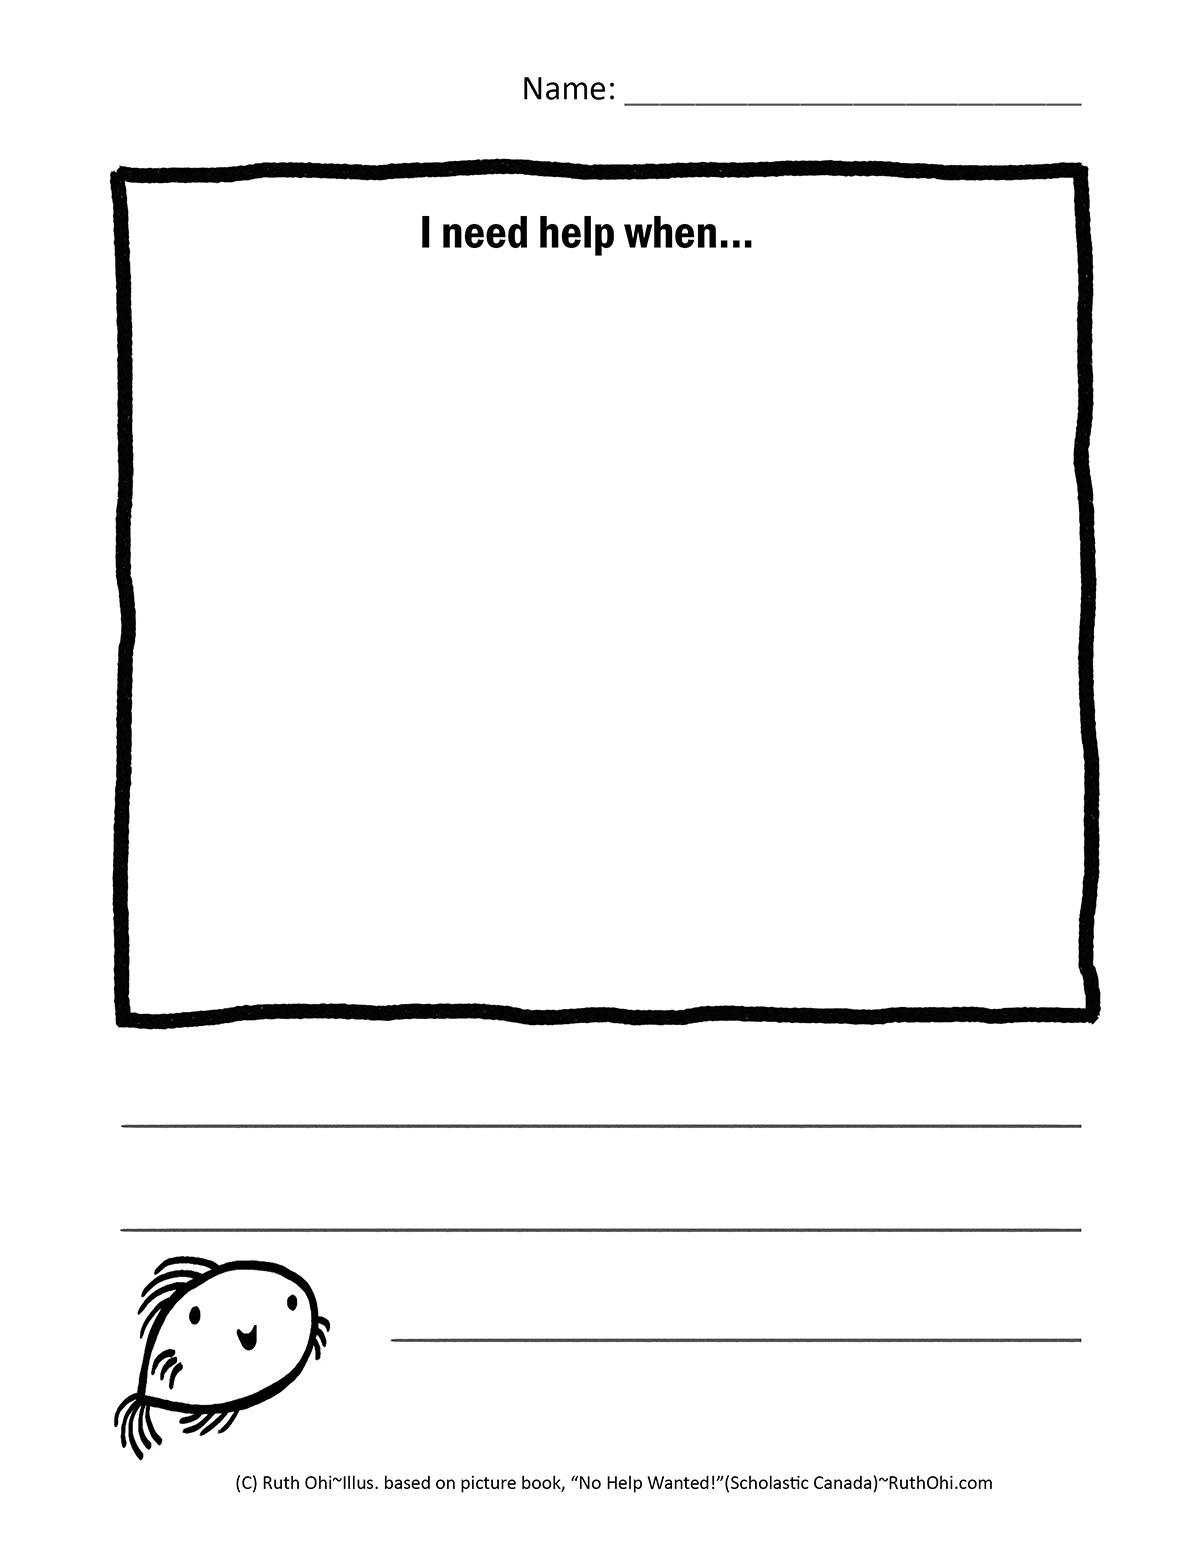 1200 I Need Help When  NO HELP WANTED.jpg